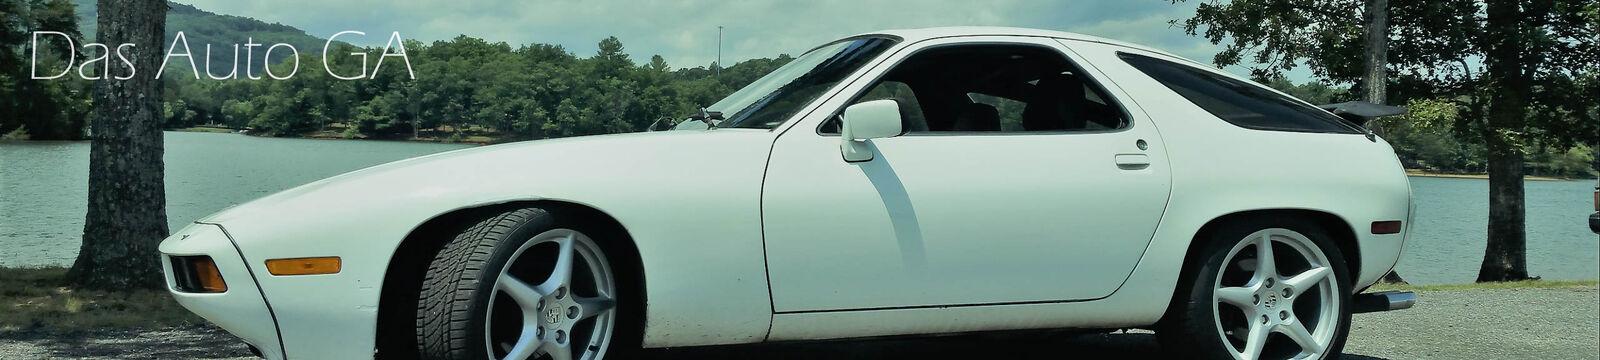 Das Auto GA